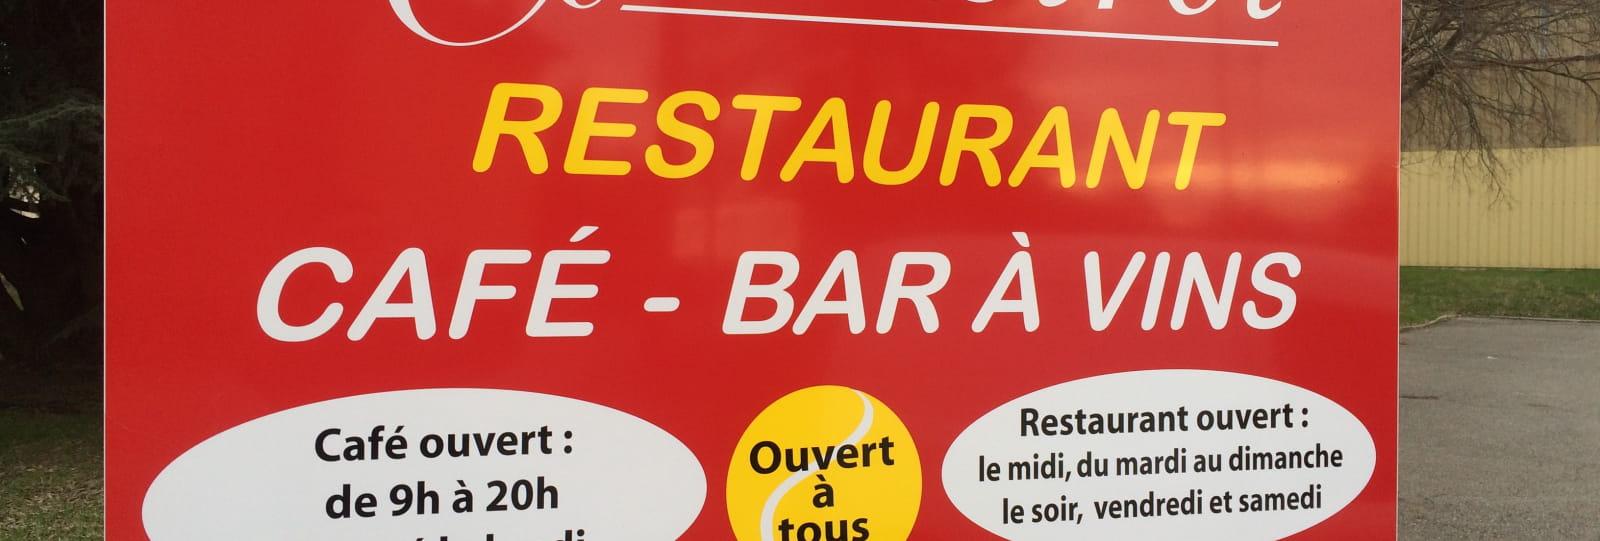 Restaurant Côté Bistrot